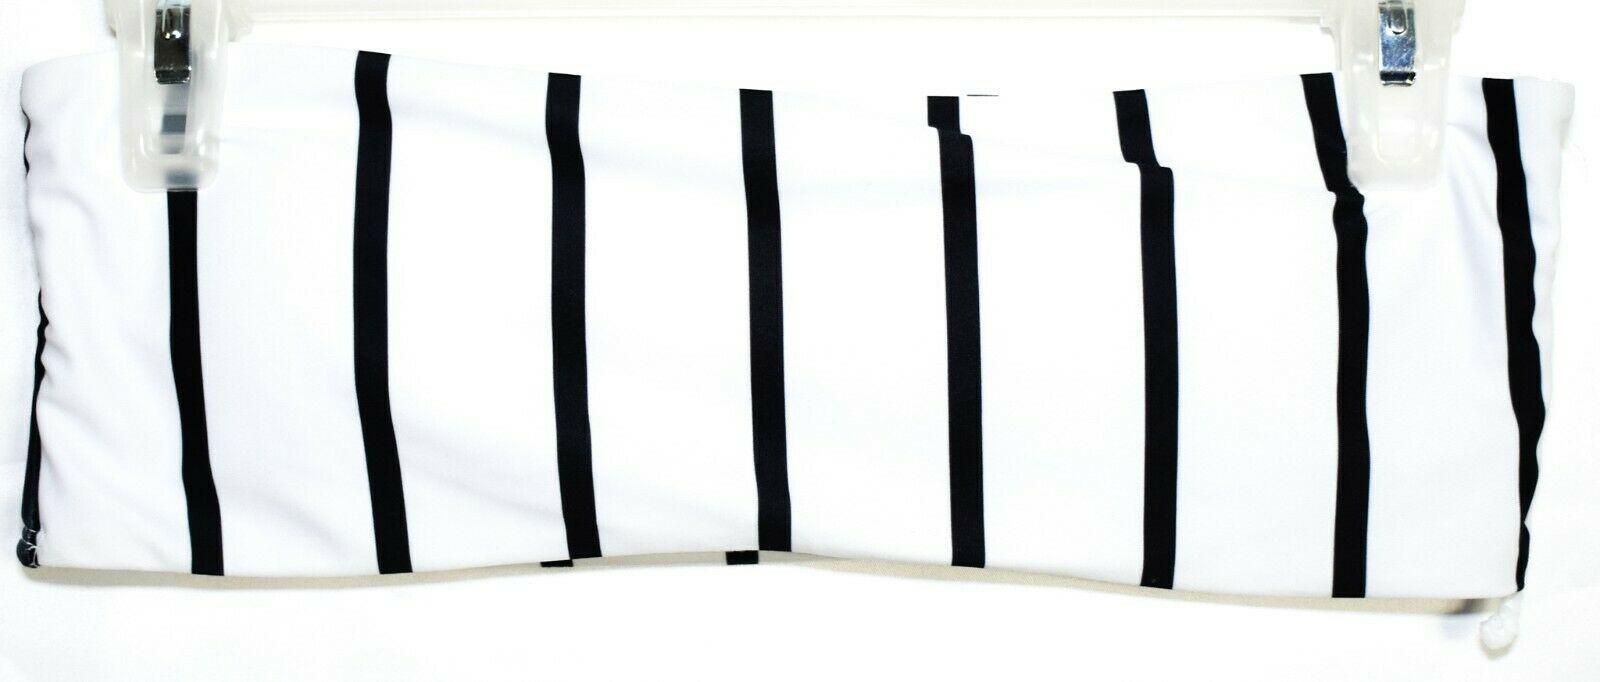 Zaful Black & White Vertical Striped Bandeau Bikini Top US 4 | UK 8